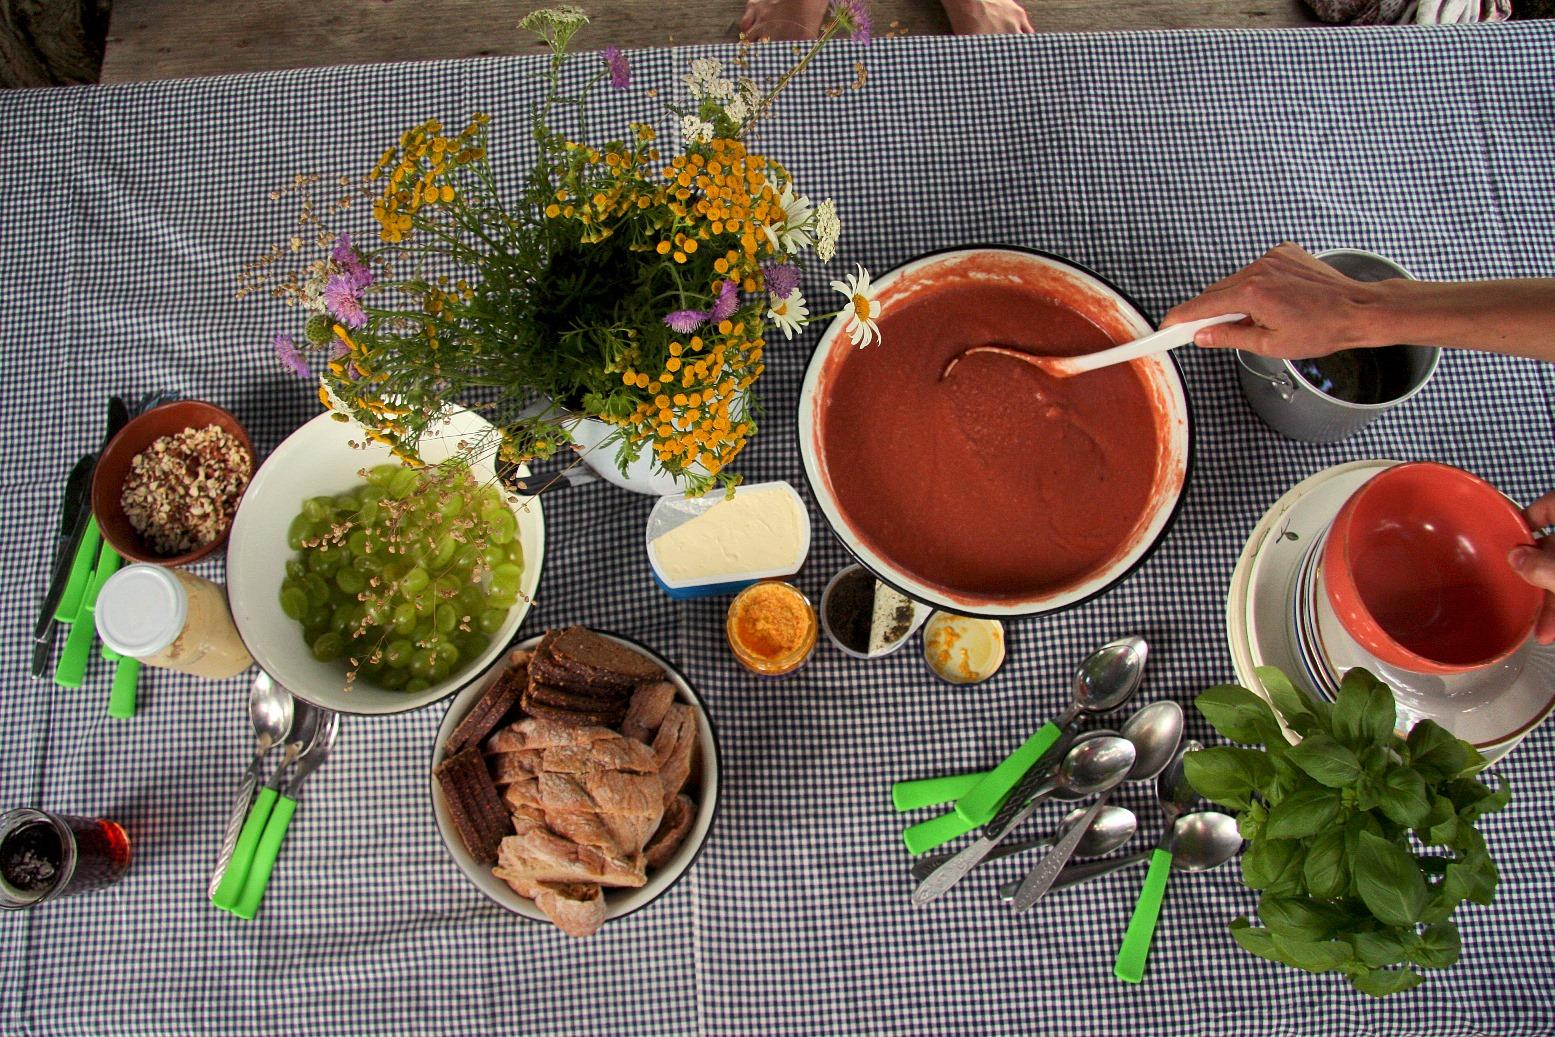 Aukstā tomātu-maizes zupa ar vīnogām (salmorejo)